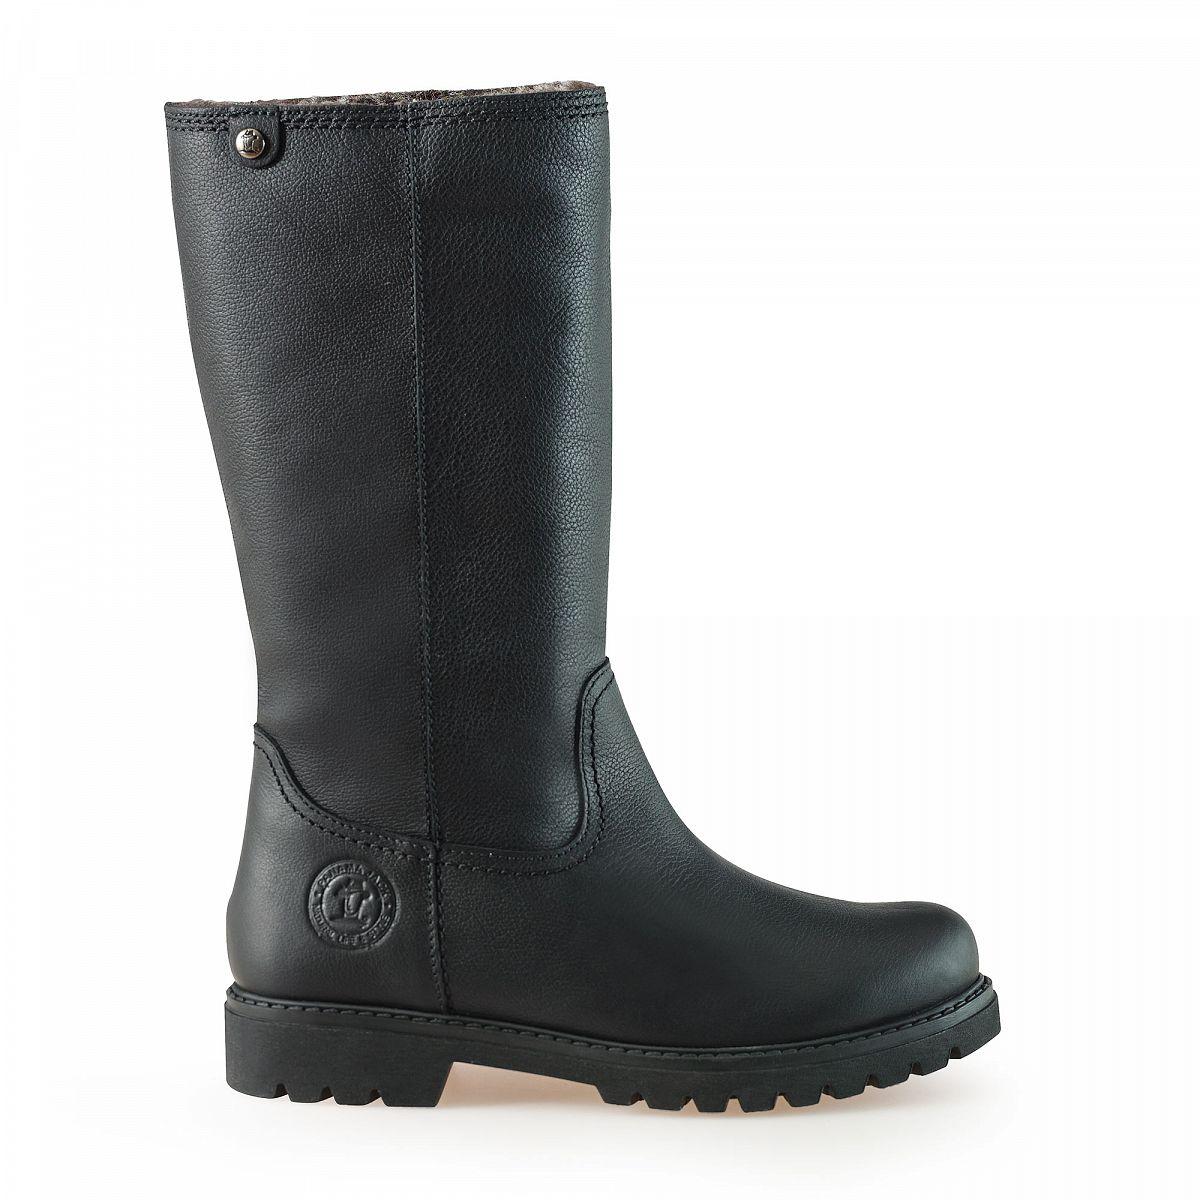 Womens boots bambina black panama jack 174 online shop